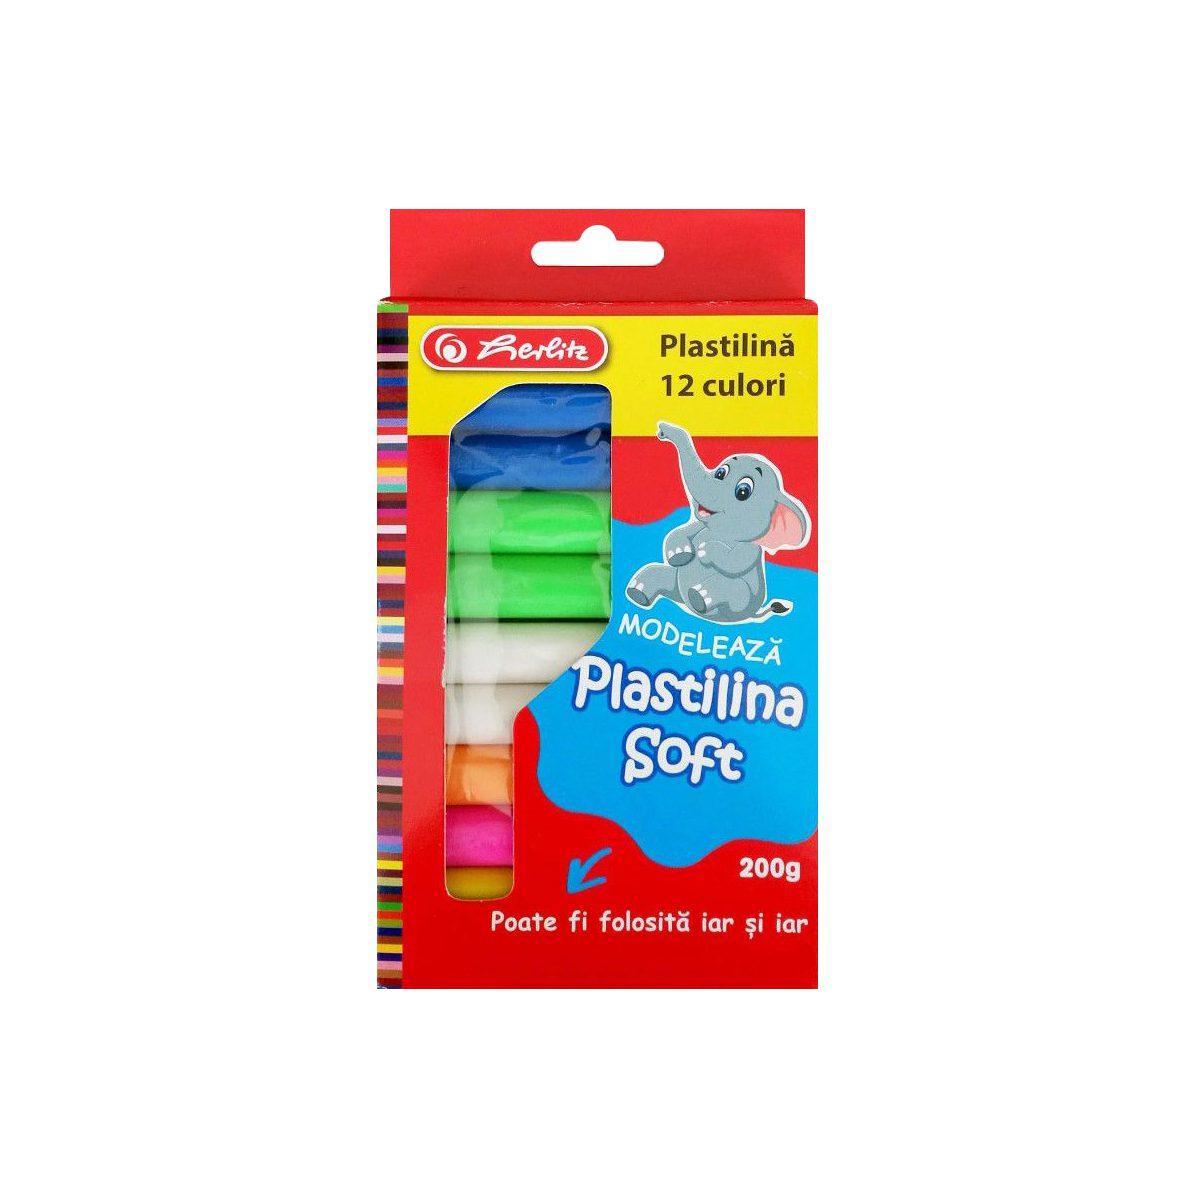 Plastilină Soft Clay, 12 Batoane, 8 Culori Asortate, Herlitz, 786950